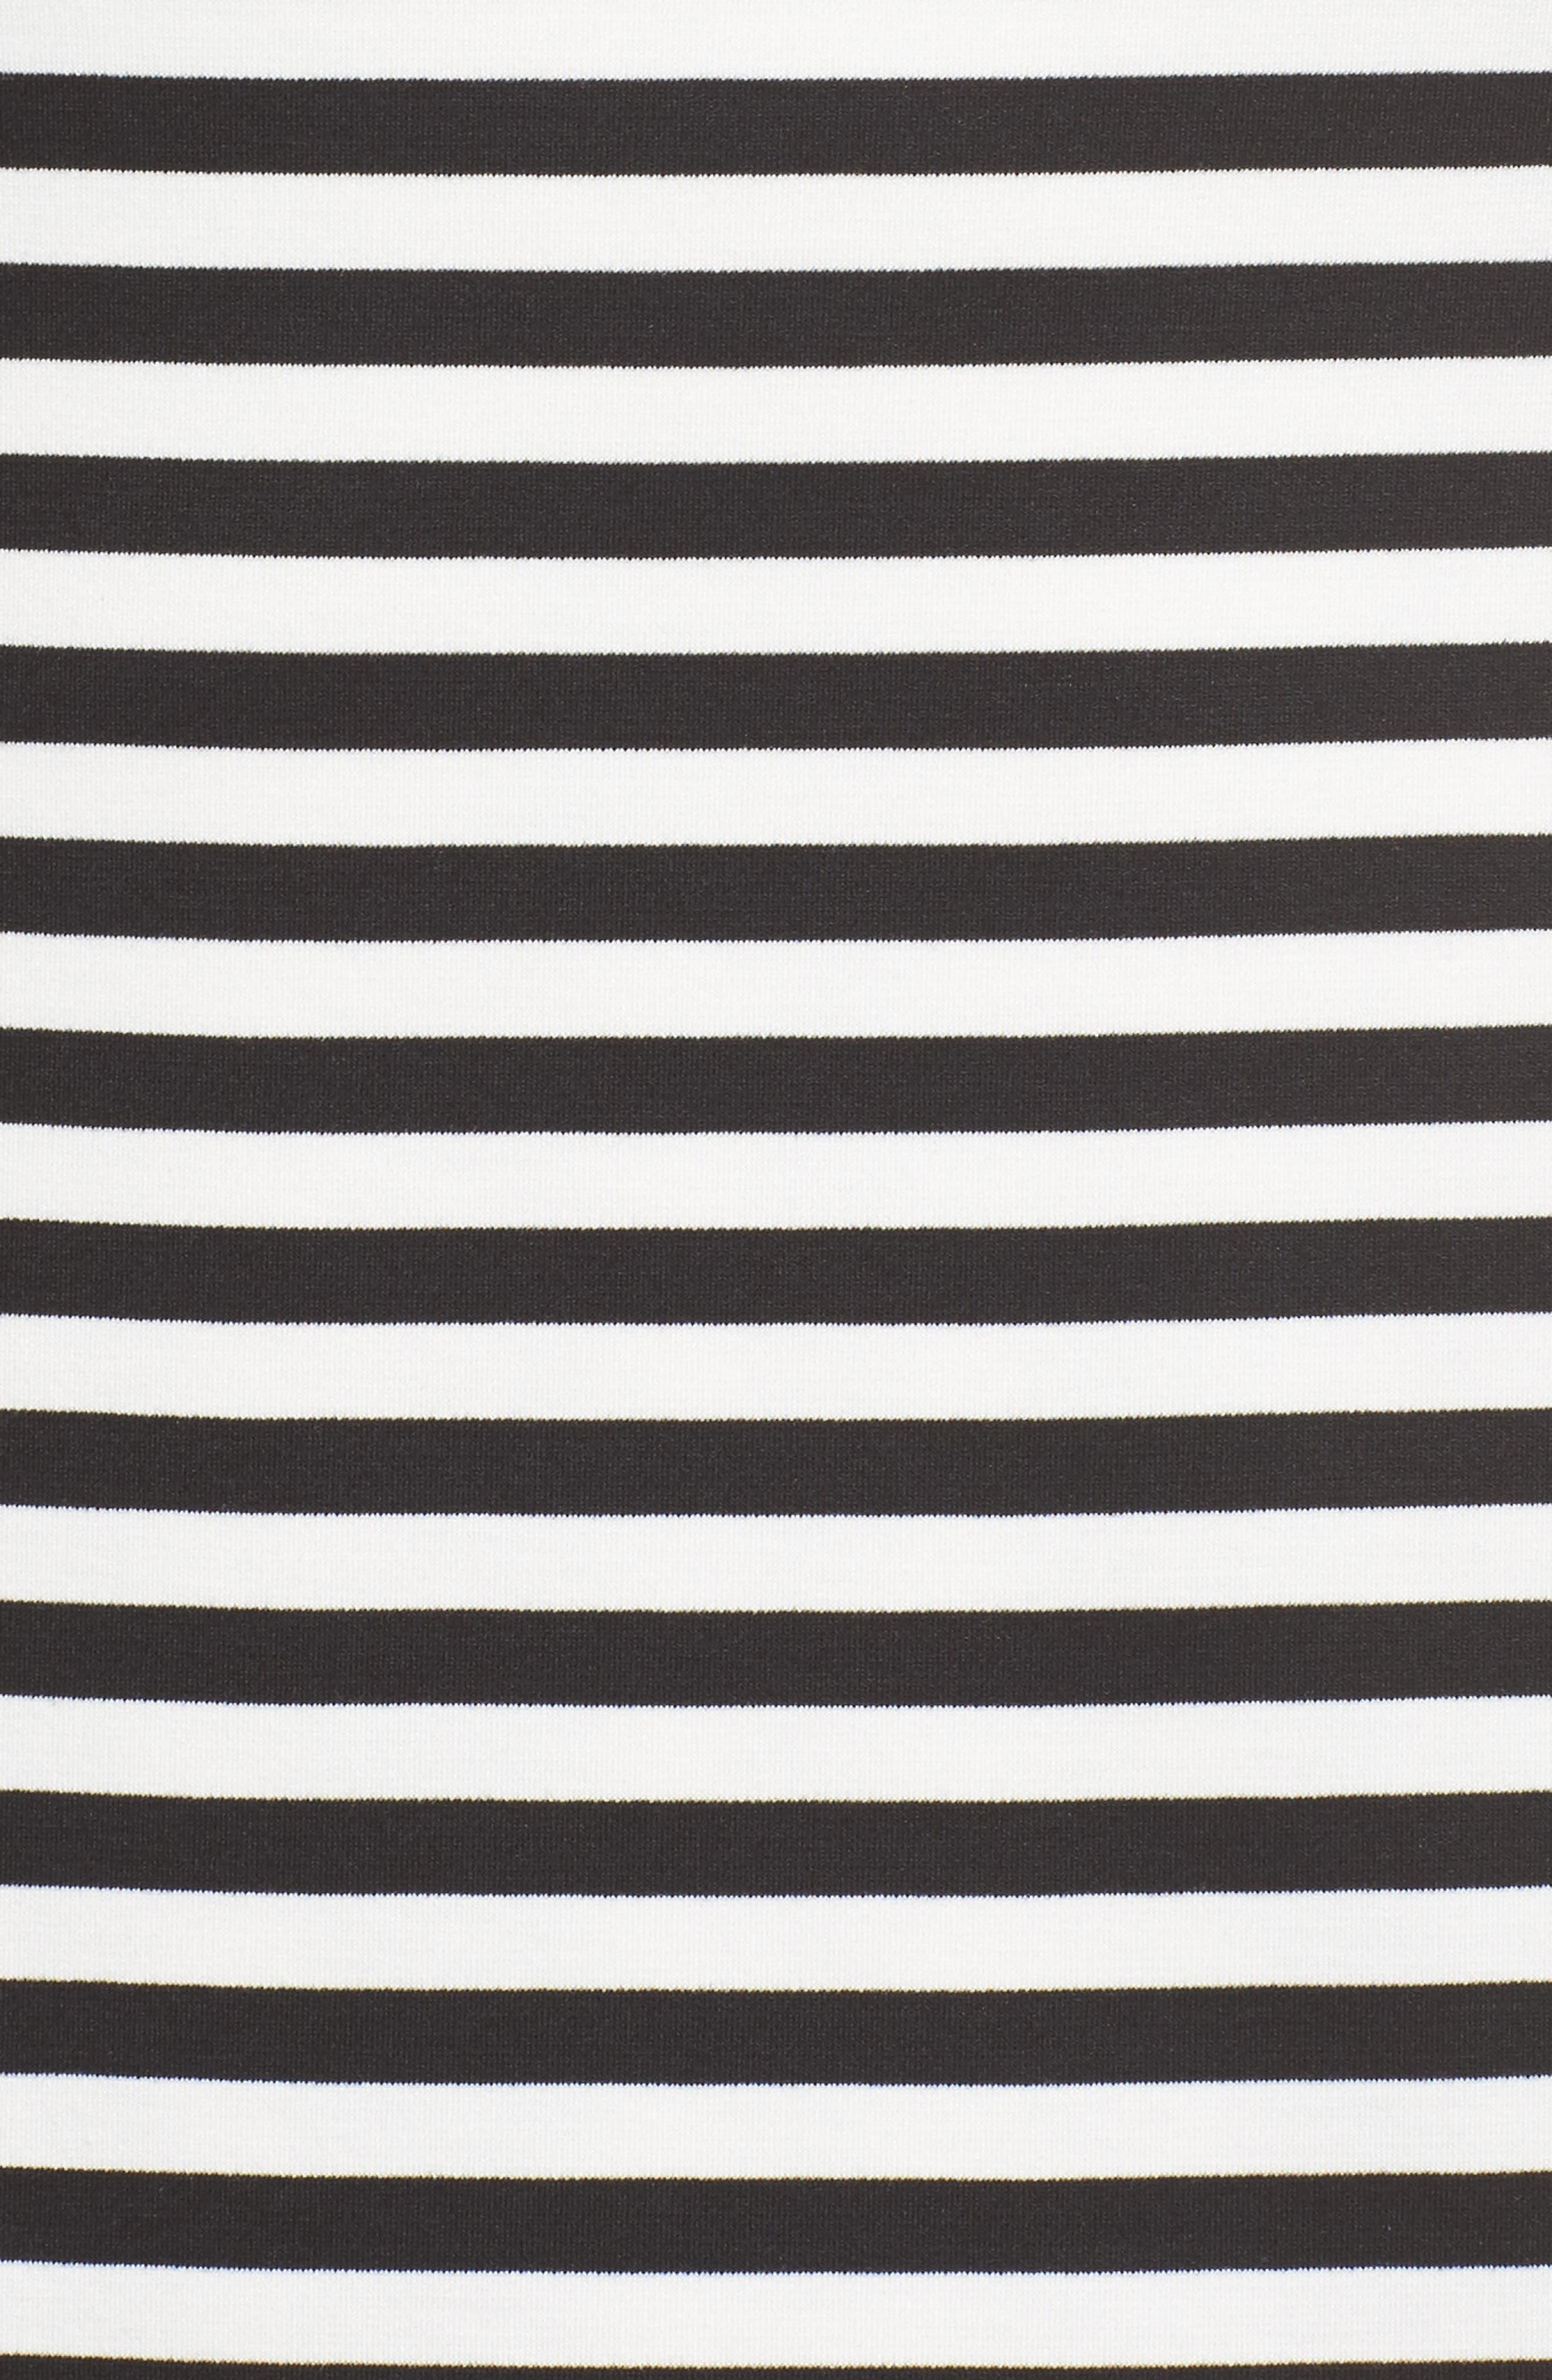 Godet Body-Con Dress,                             Alternate thumbnail 5, color,                             Black/ Ivory